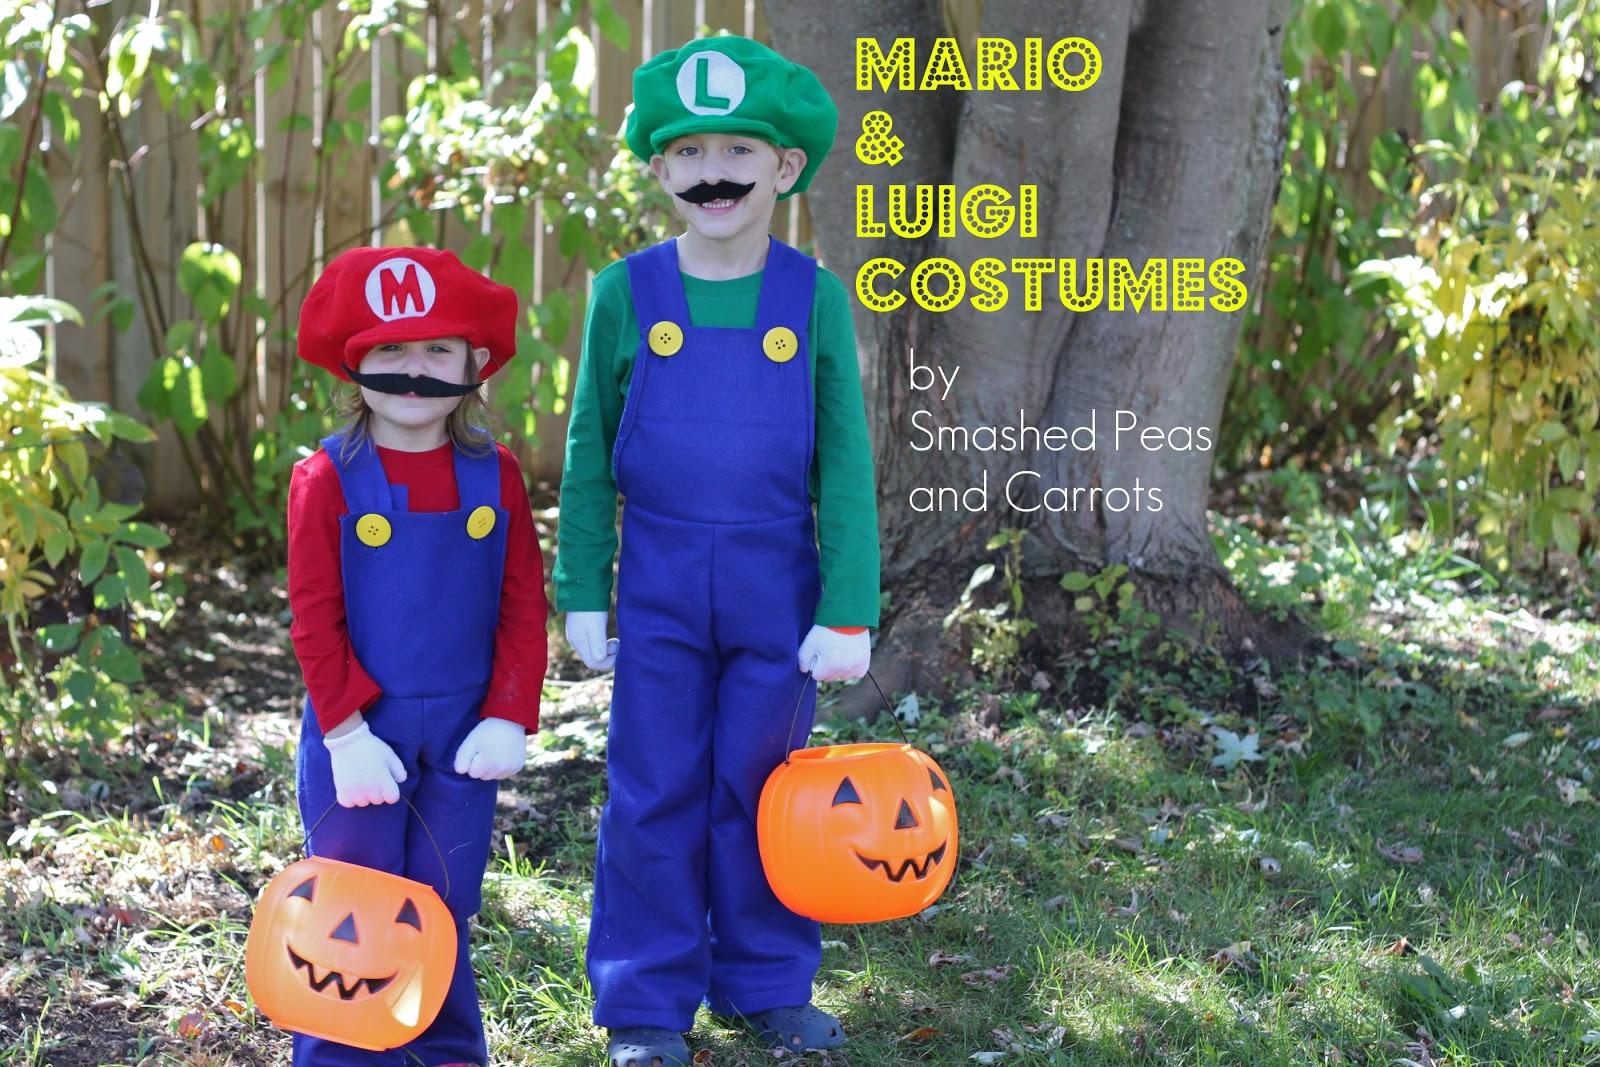 How to Make Mario and Luigi Costumes - Smashed Peas ...